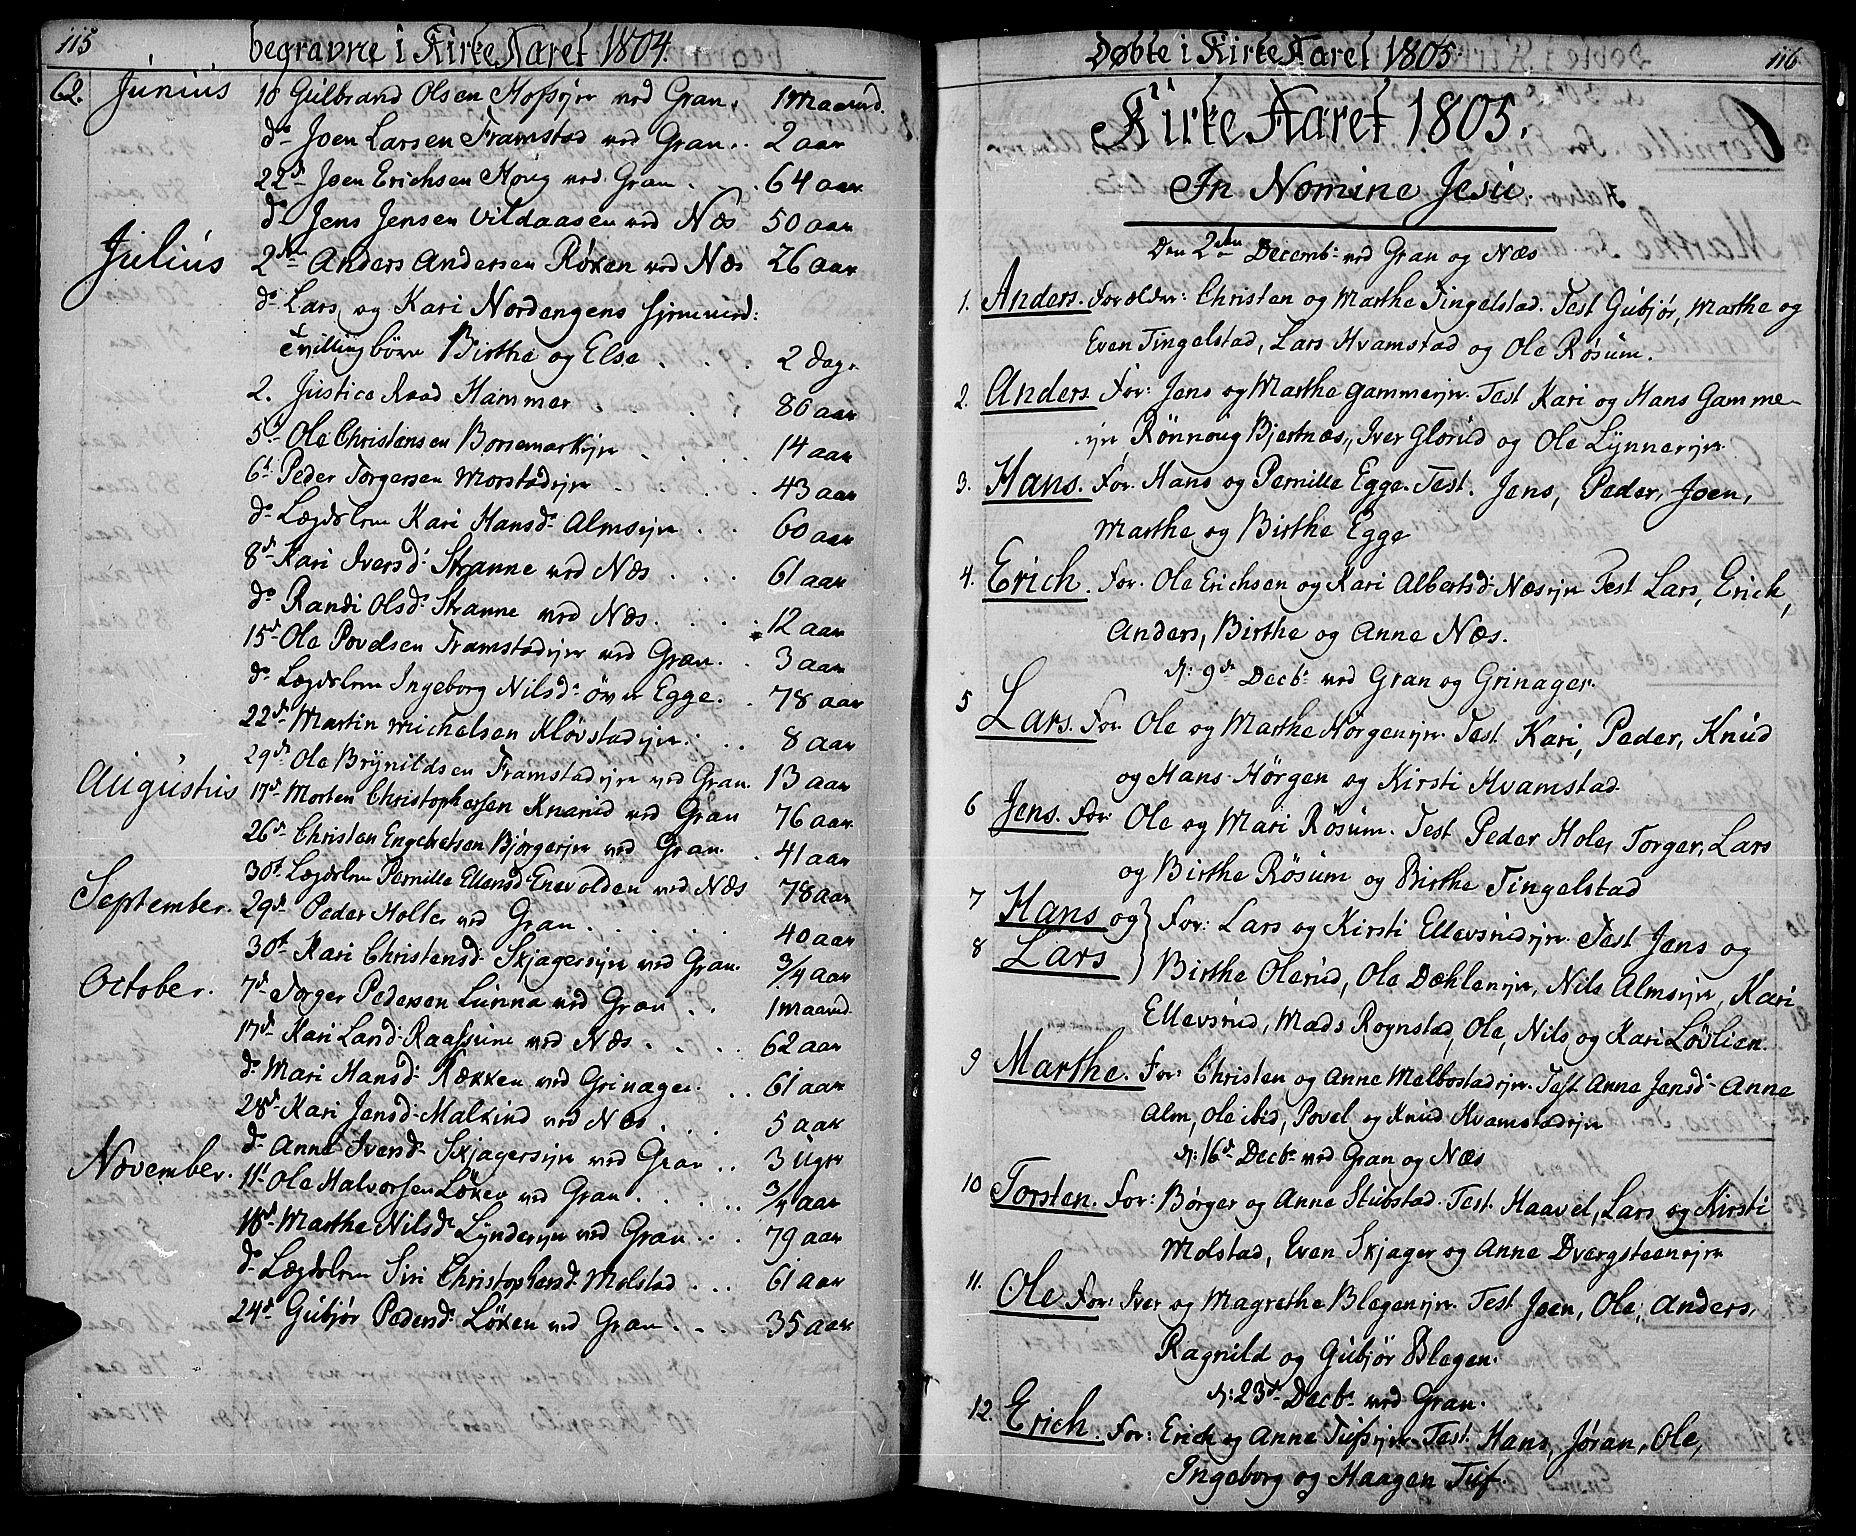 SAH, Gran prestekontor, Ministerialbok nr. 8, 1798-1811, s. 115-116